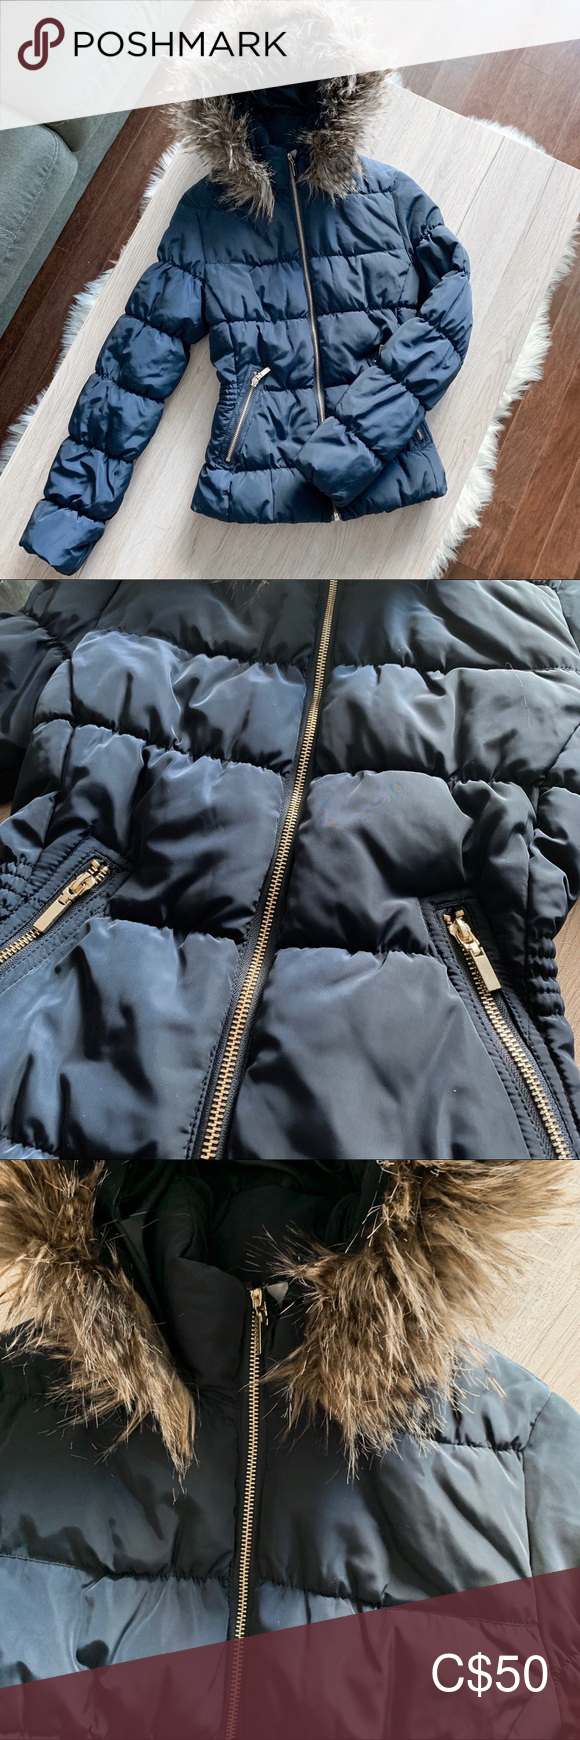 H&M Puffer Winter Jacket w/ Fur Hood Winter jackets, Fur